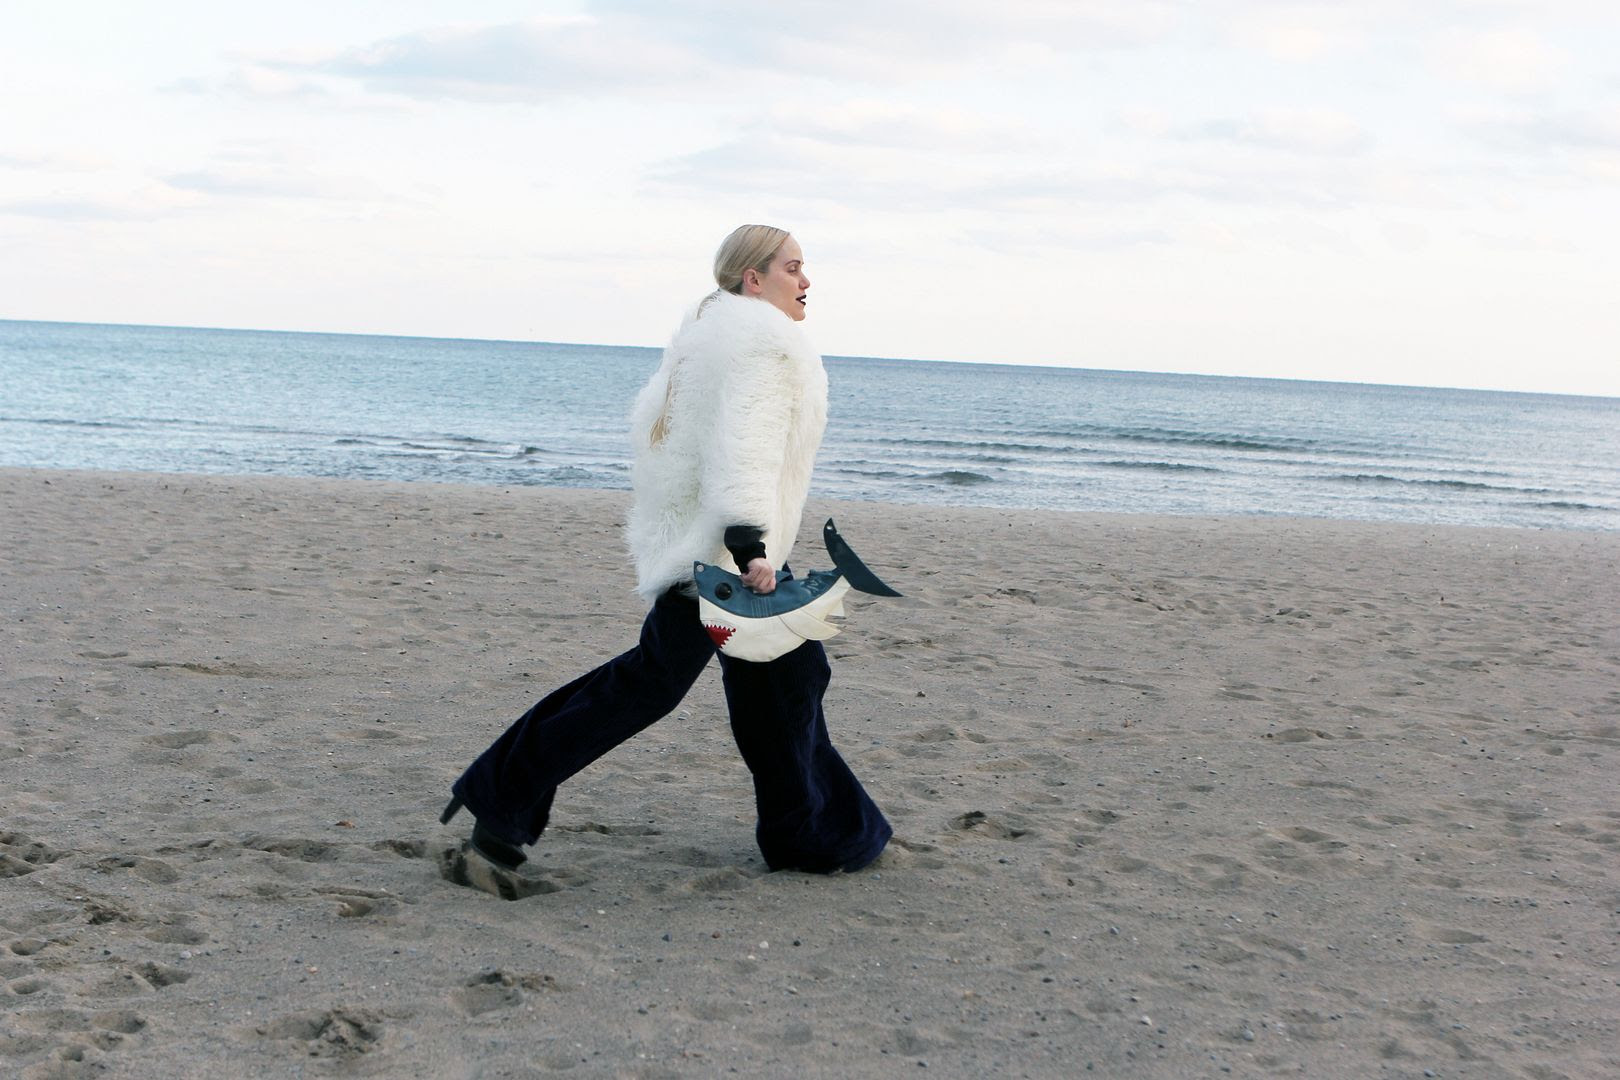 photo beckermanblog-caillibeckerman-skotison-beach-HM-Rodnicksharkbag-kitnealeandtattydevinepins-1-Toronto-2_zpsb6c2231b.jpg